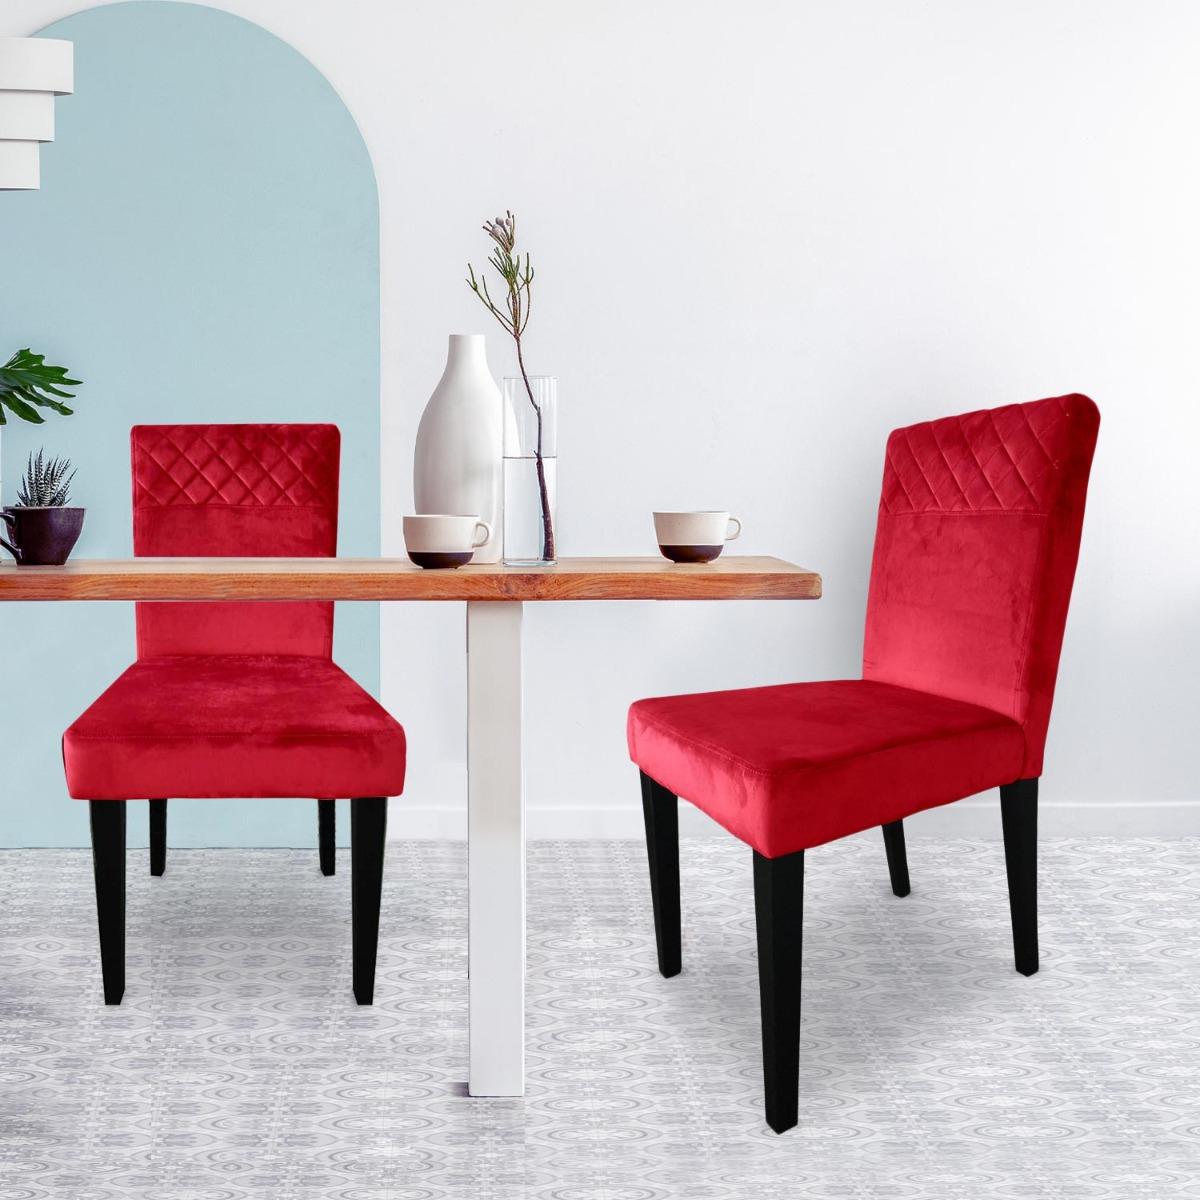 Set di 2 sedie trapuntate Milo in velluto rosso